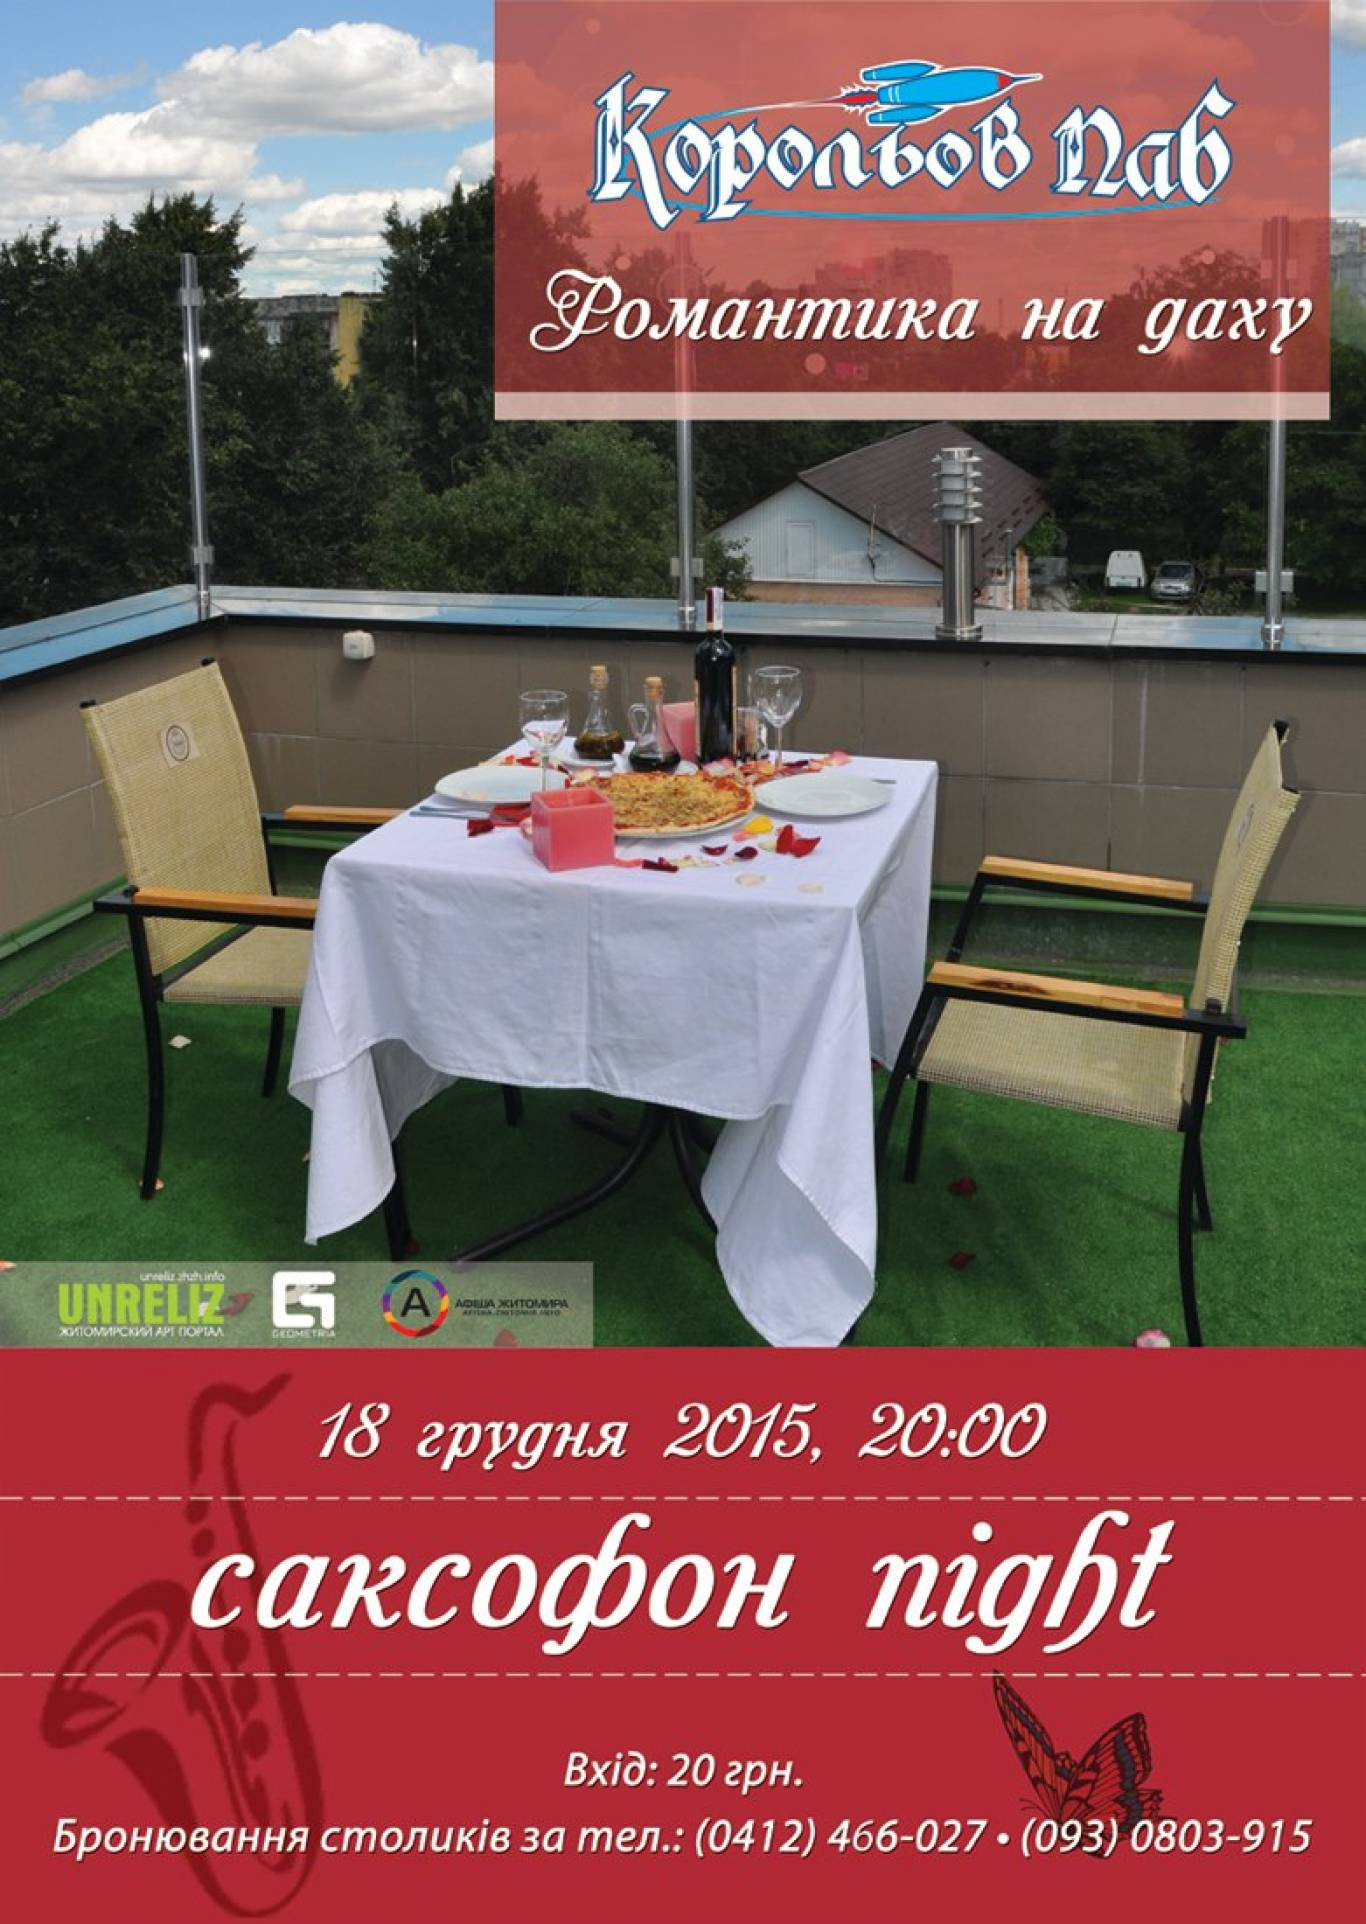 "Саксофон Night у ""Корольов Пабі"""